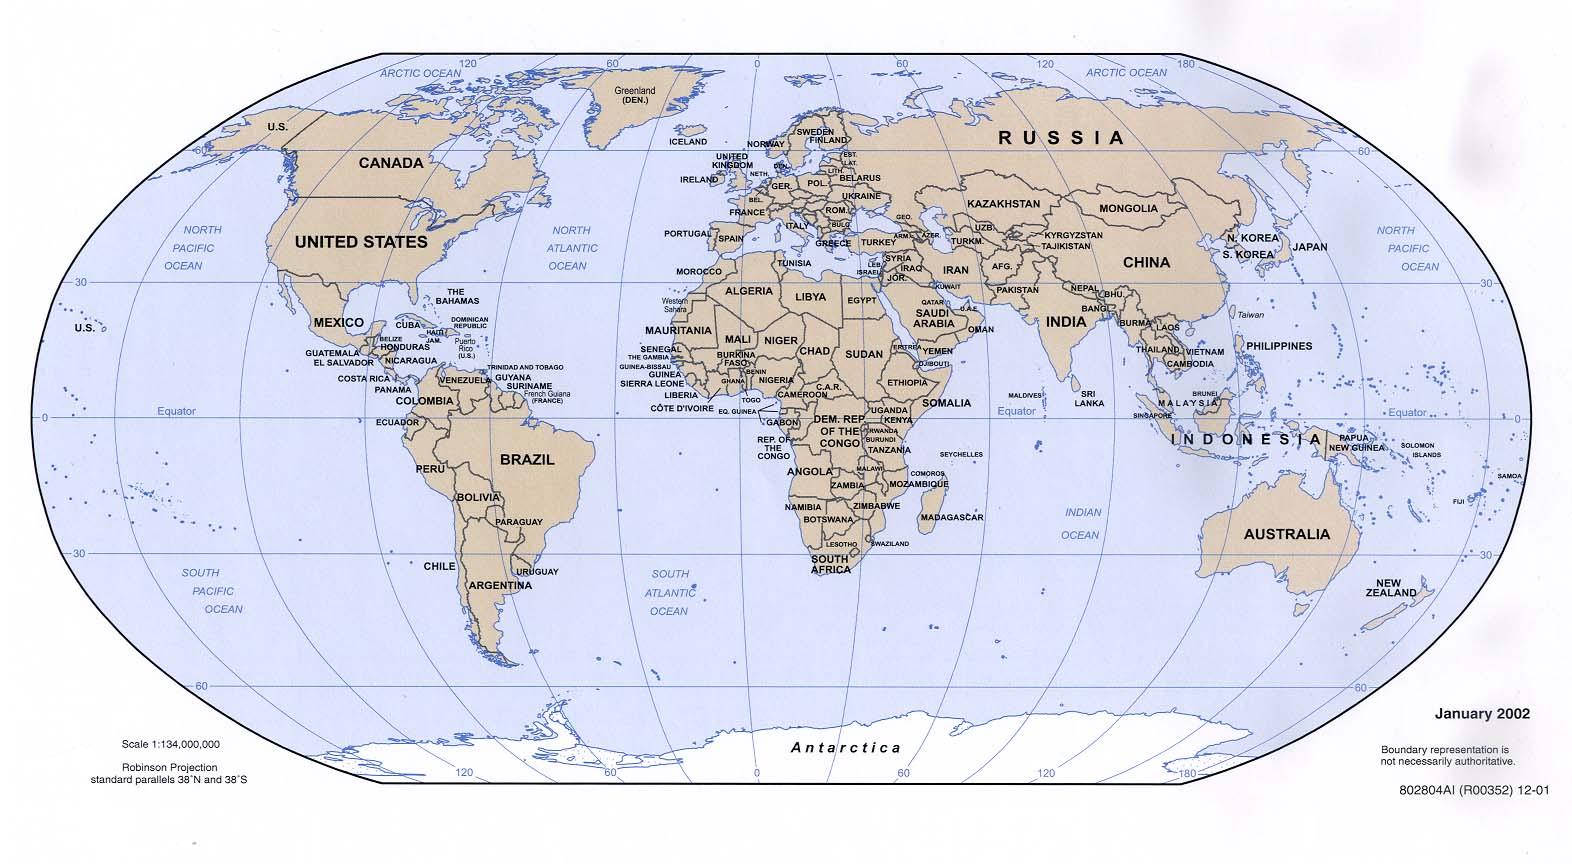 World political map 2002 Full size